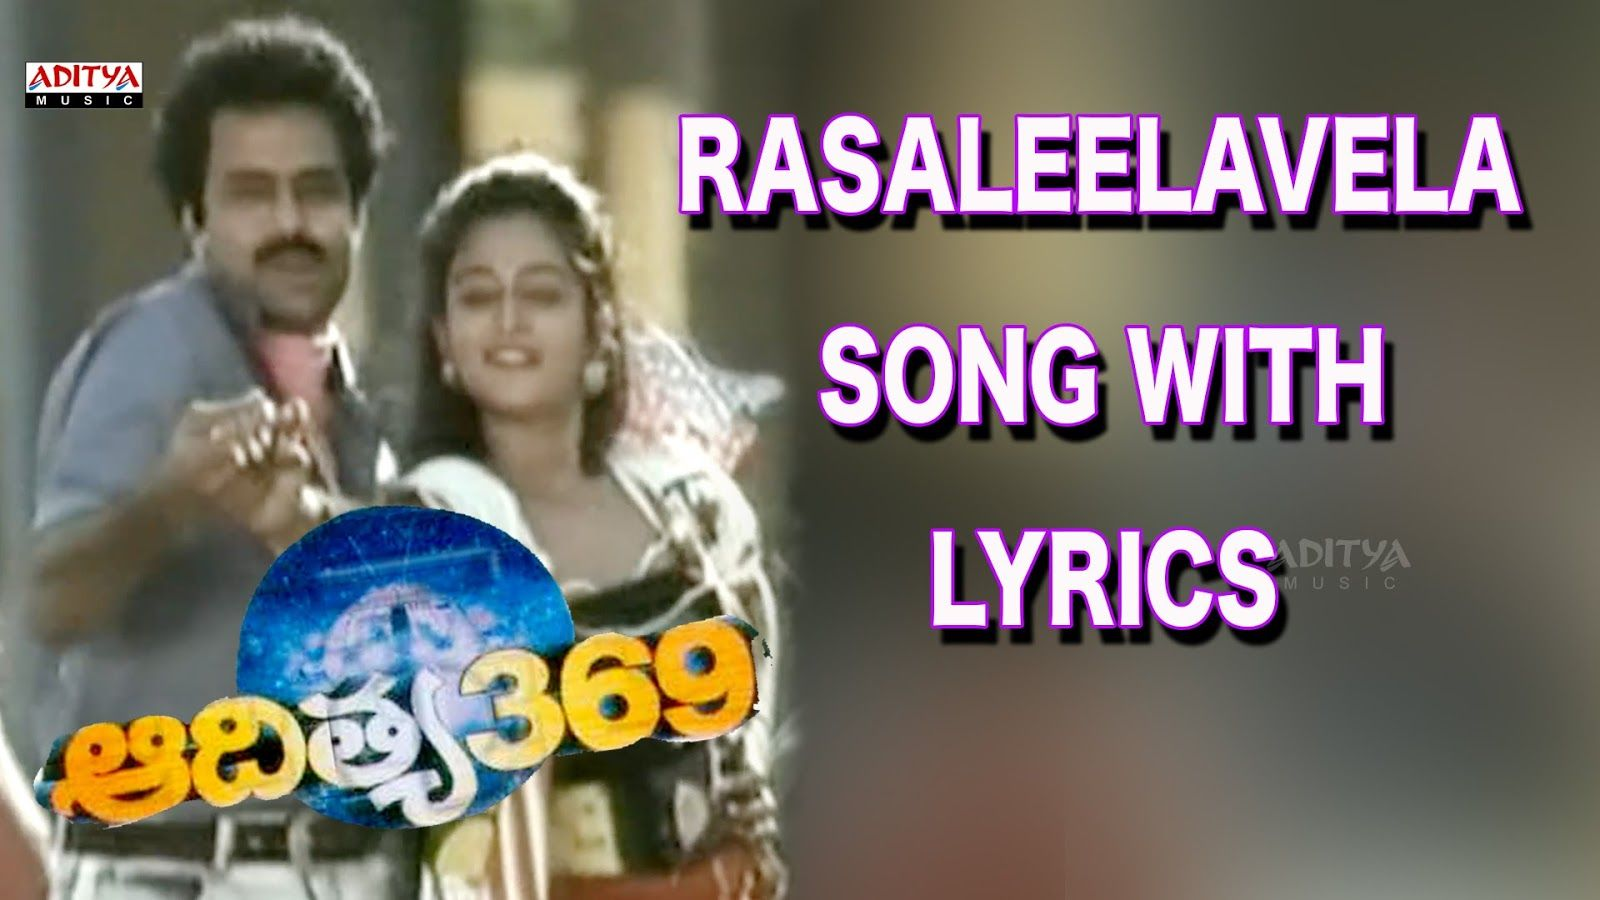 Rasaleela Vela Song Lyrics from Aditya 369 Movie (With